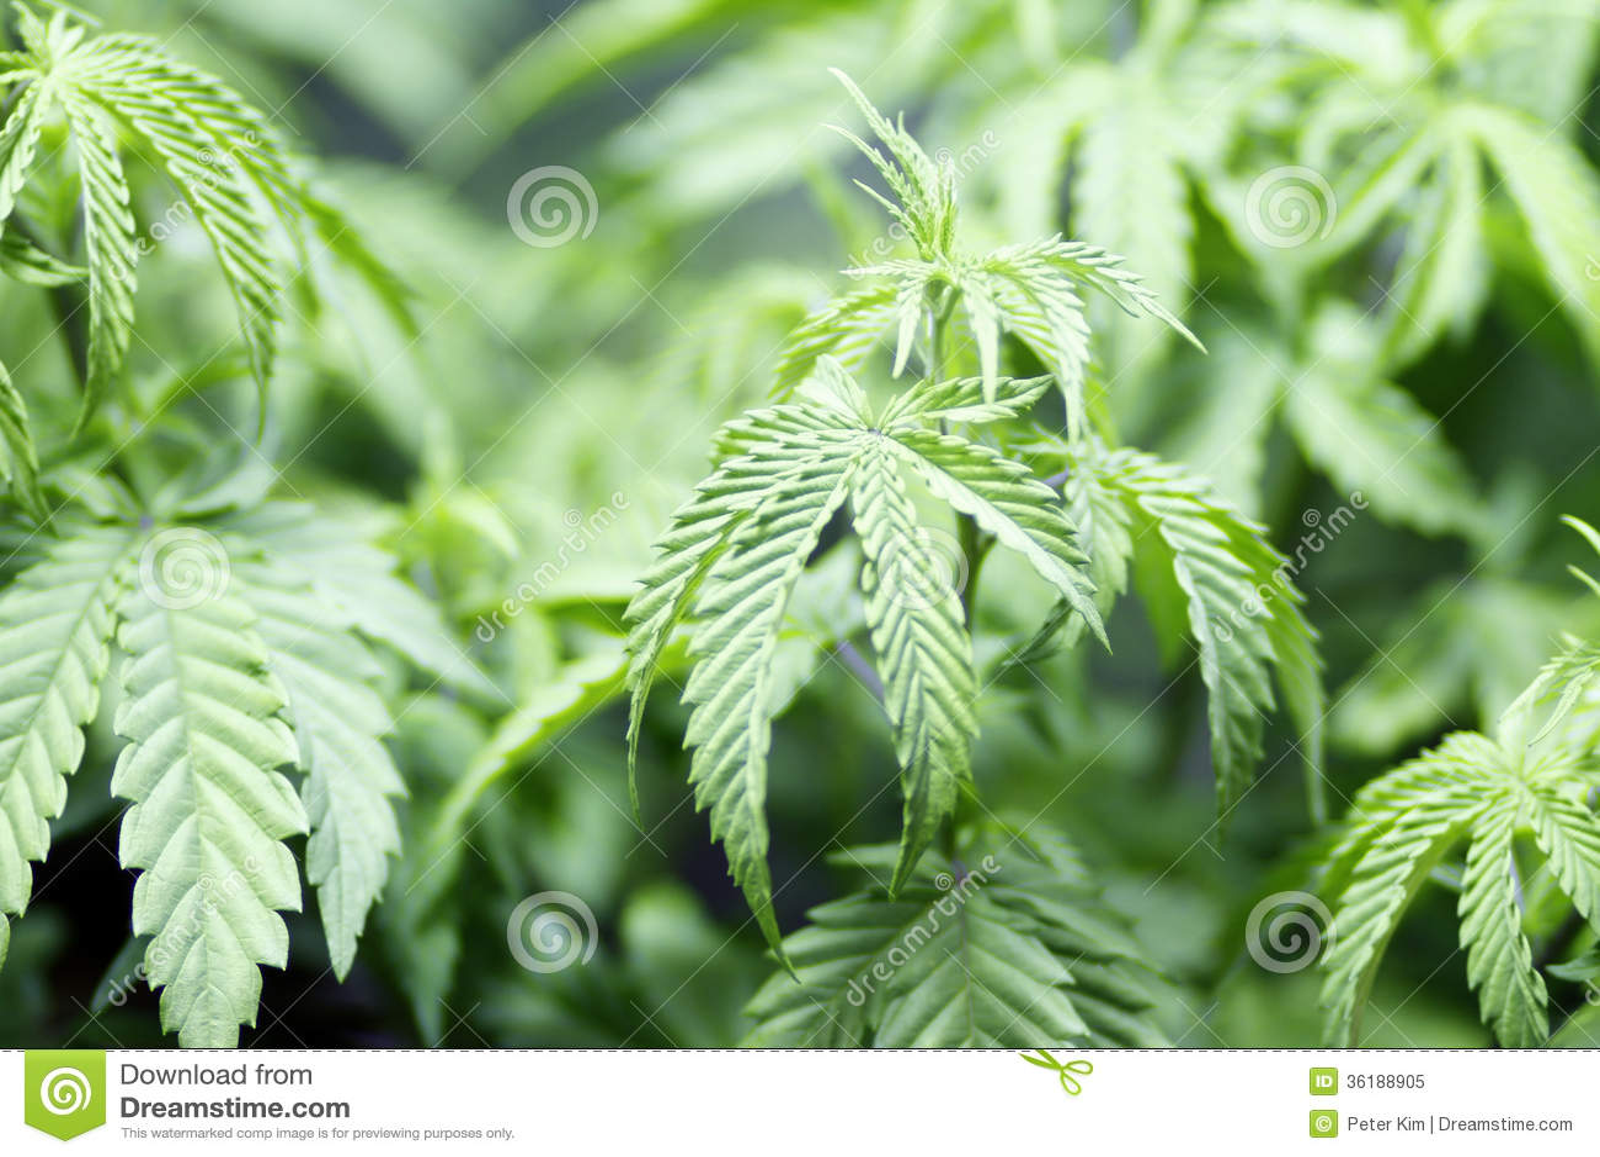 Culture de marijuana photo libre de droits image 36188905 for Cultivation de cannabis interieur